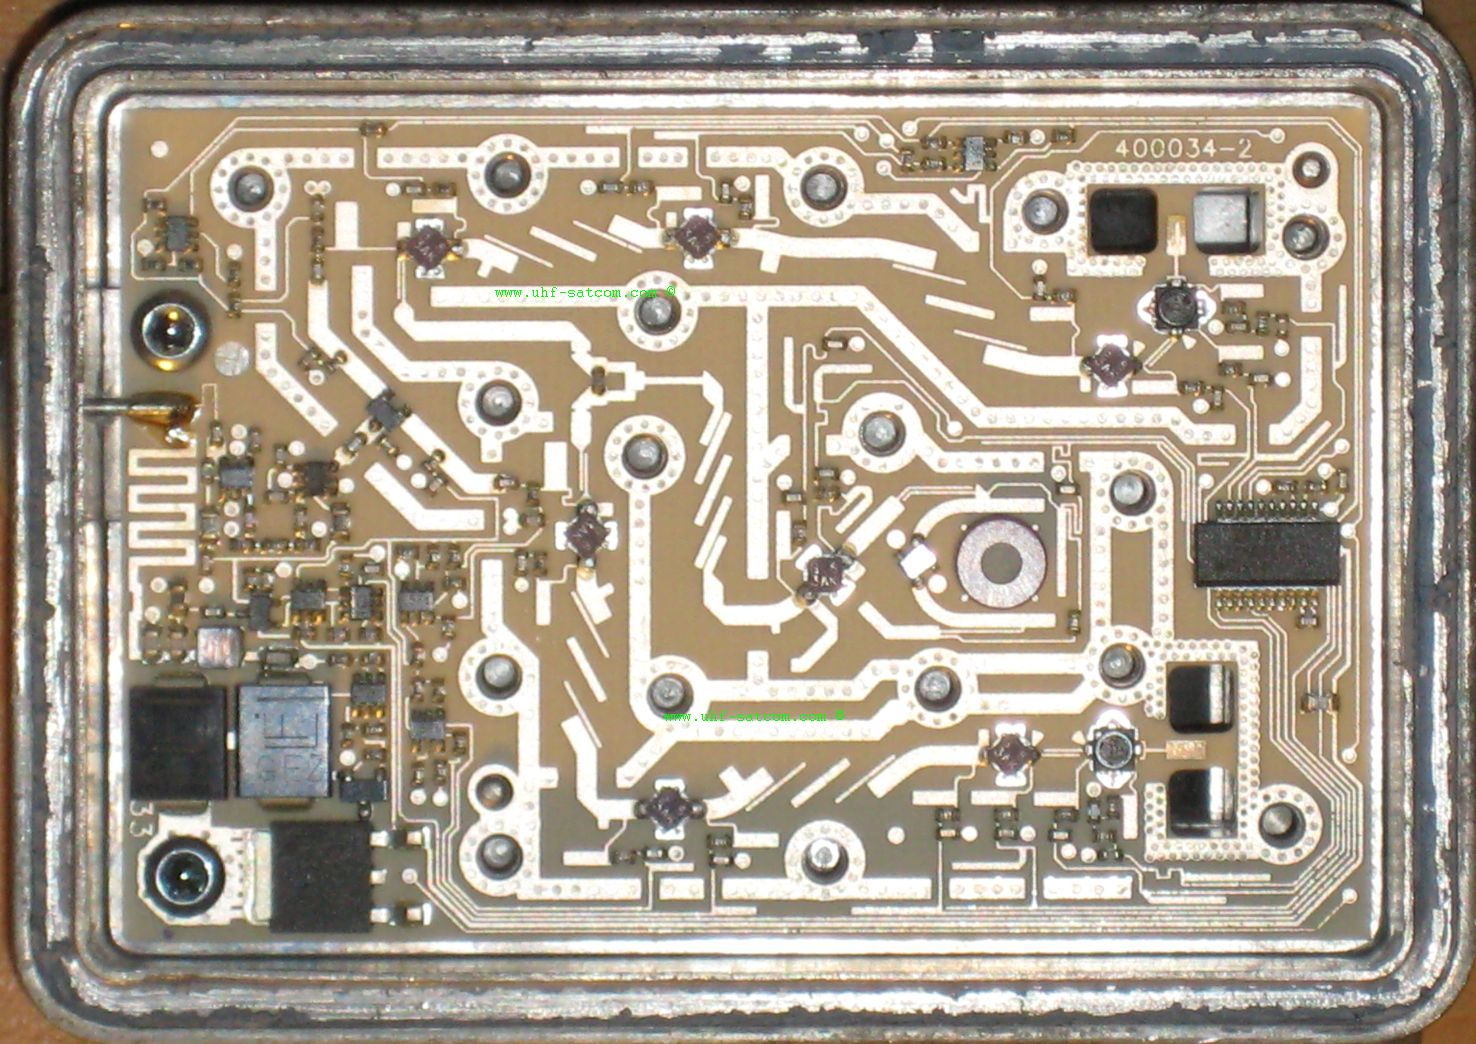 hight resolution of c band lnb circuit diagram wiring library c band satellite parts c band lnb circuit